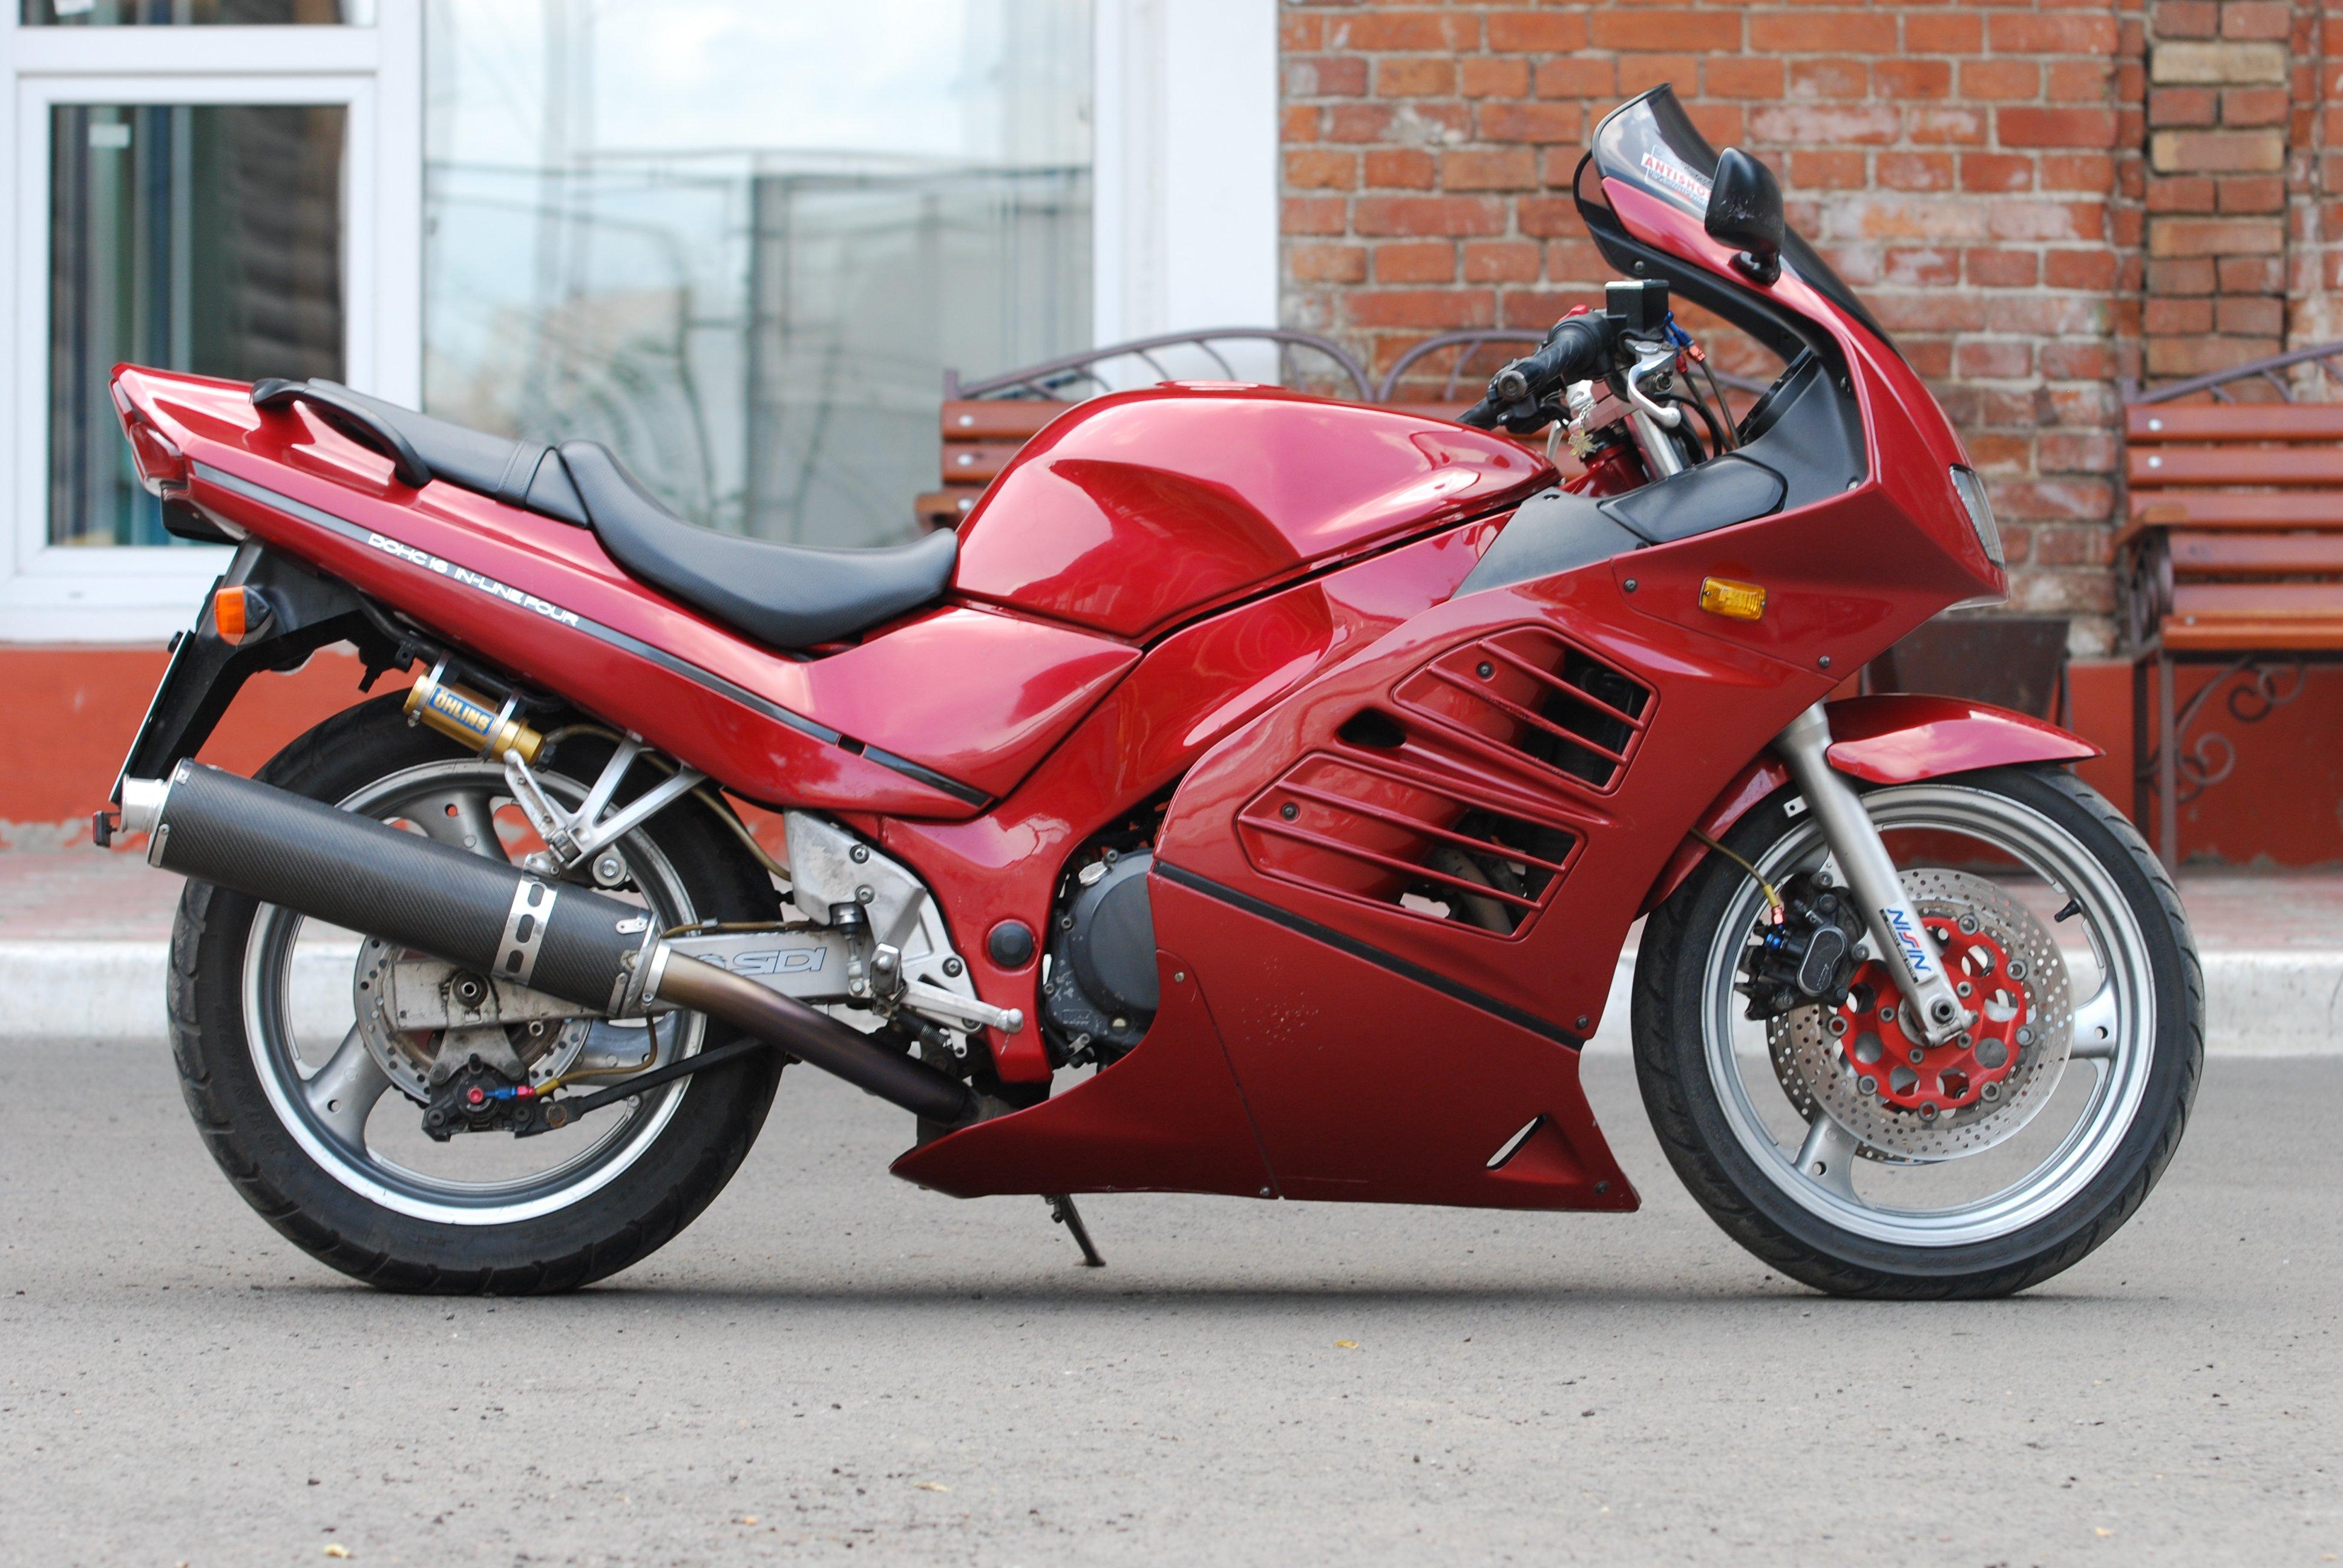 Тест-драйв мотоцикла Kawasaki ZZR 400